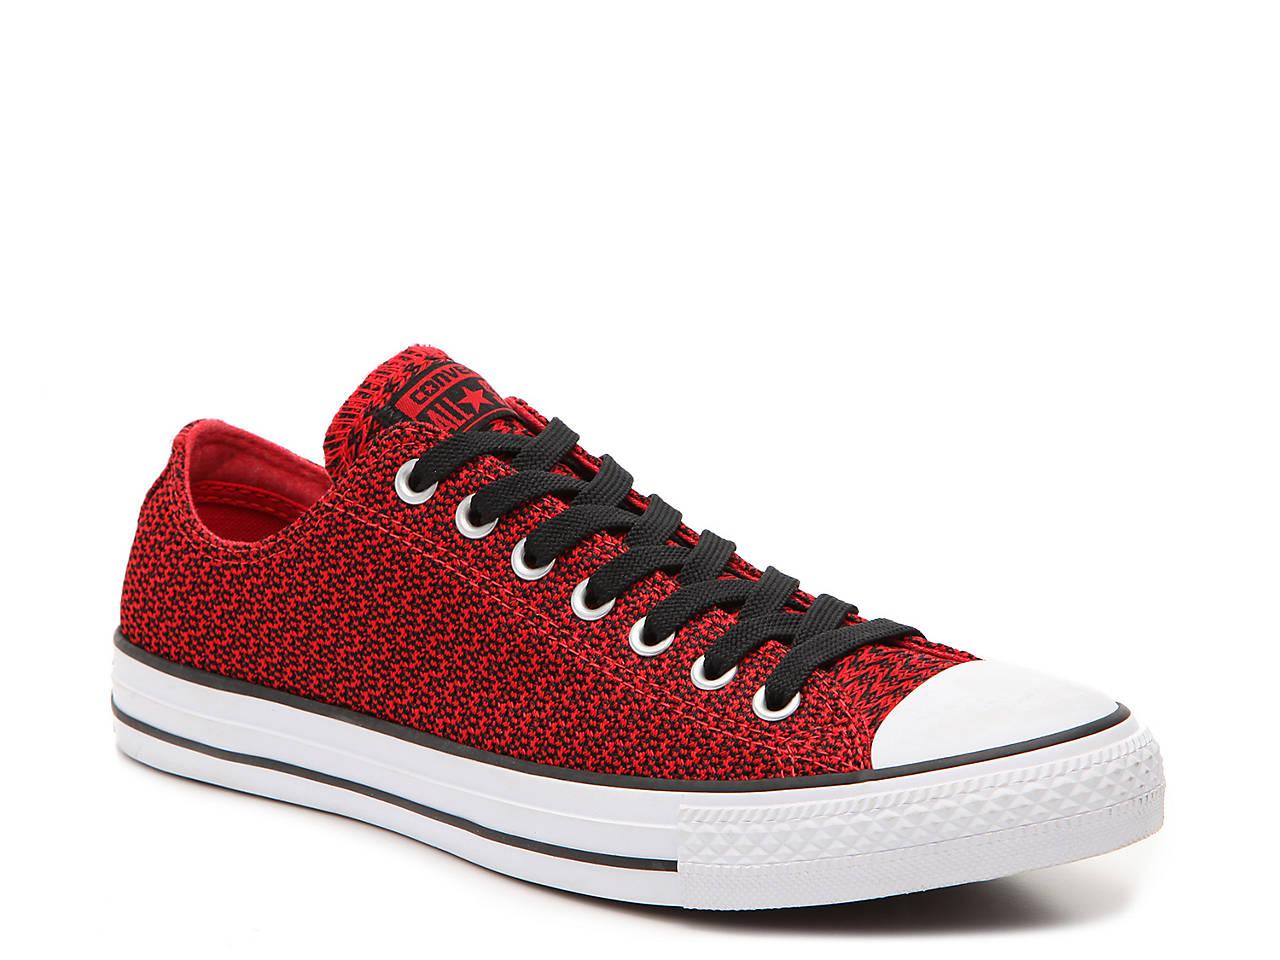 0bdbd86f2115 Converse Chuck Taylor All Star Knit Sneaker - Women s Women s Shoes ...